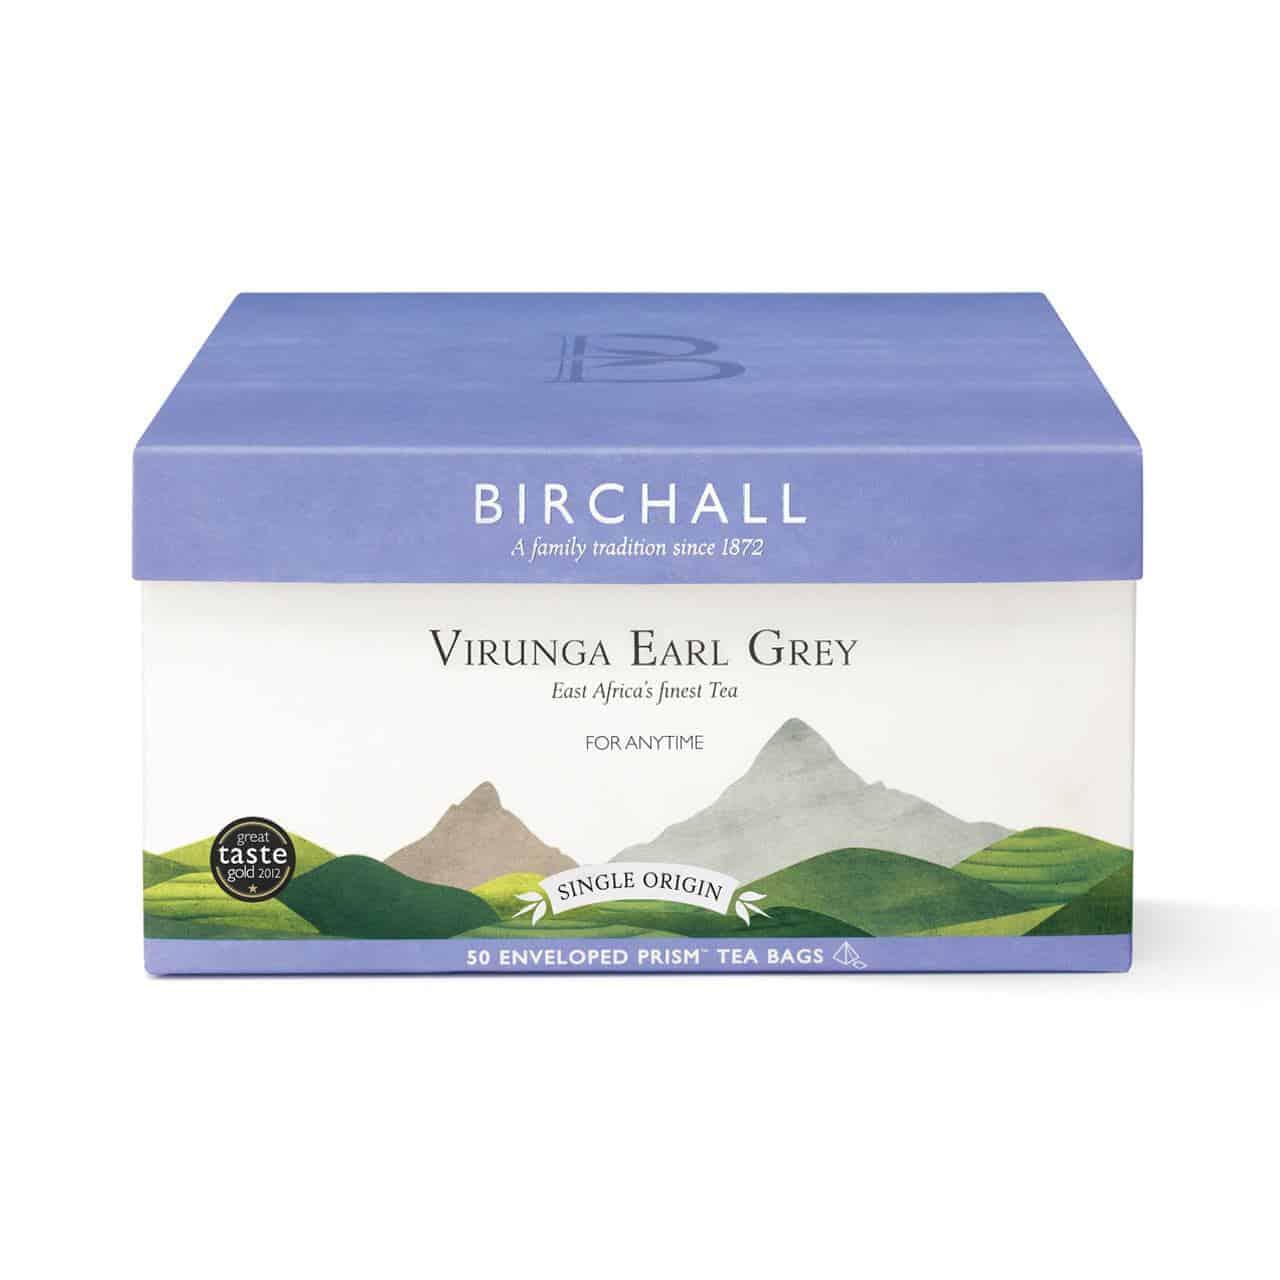 Birchall Virunga Earl Grey - 50 Enveloped Prism Tea Bags